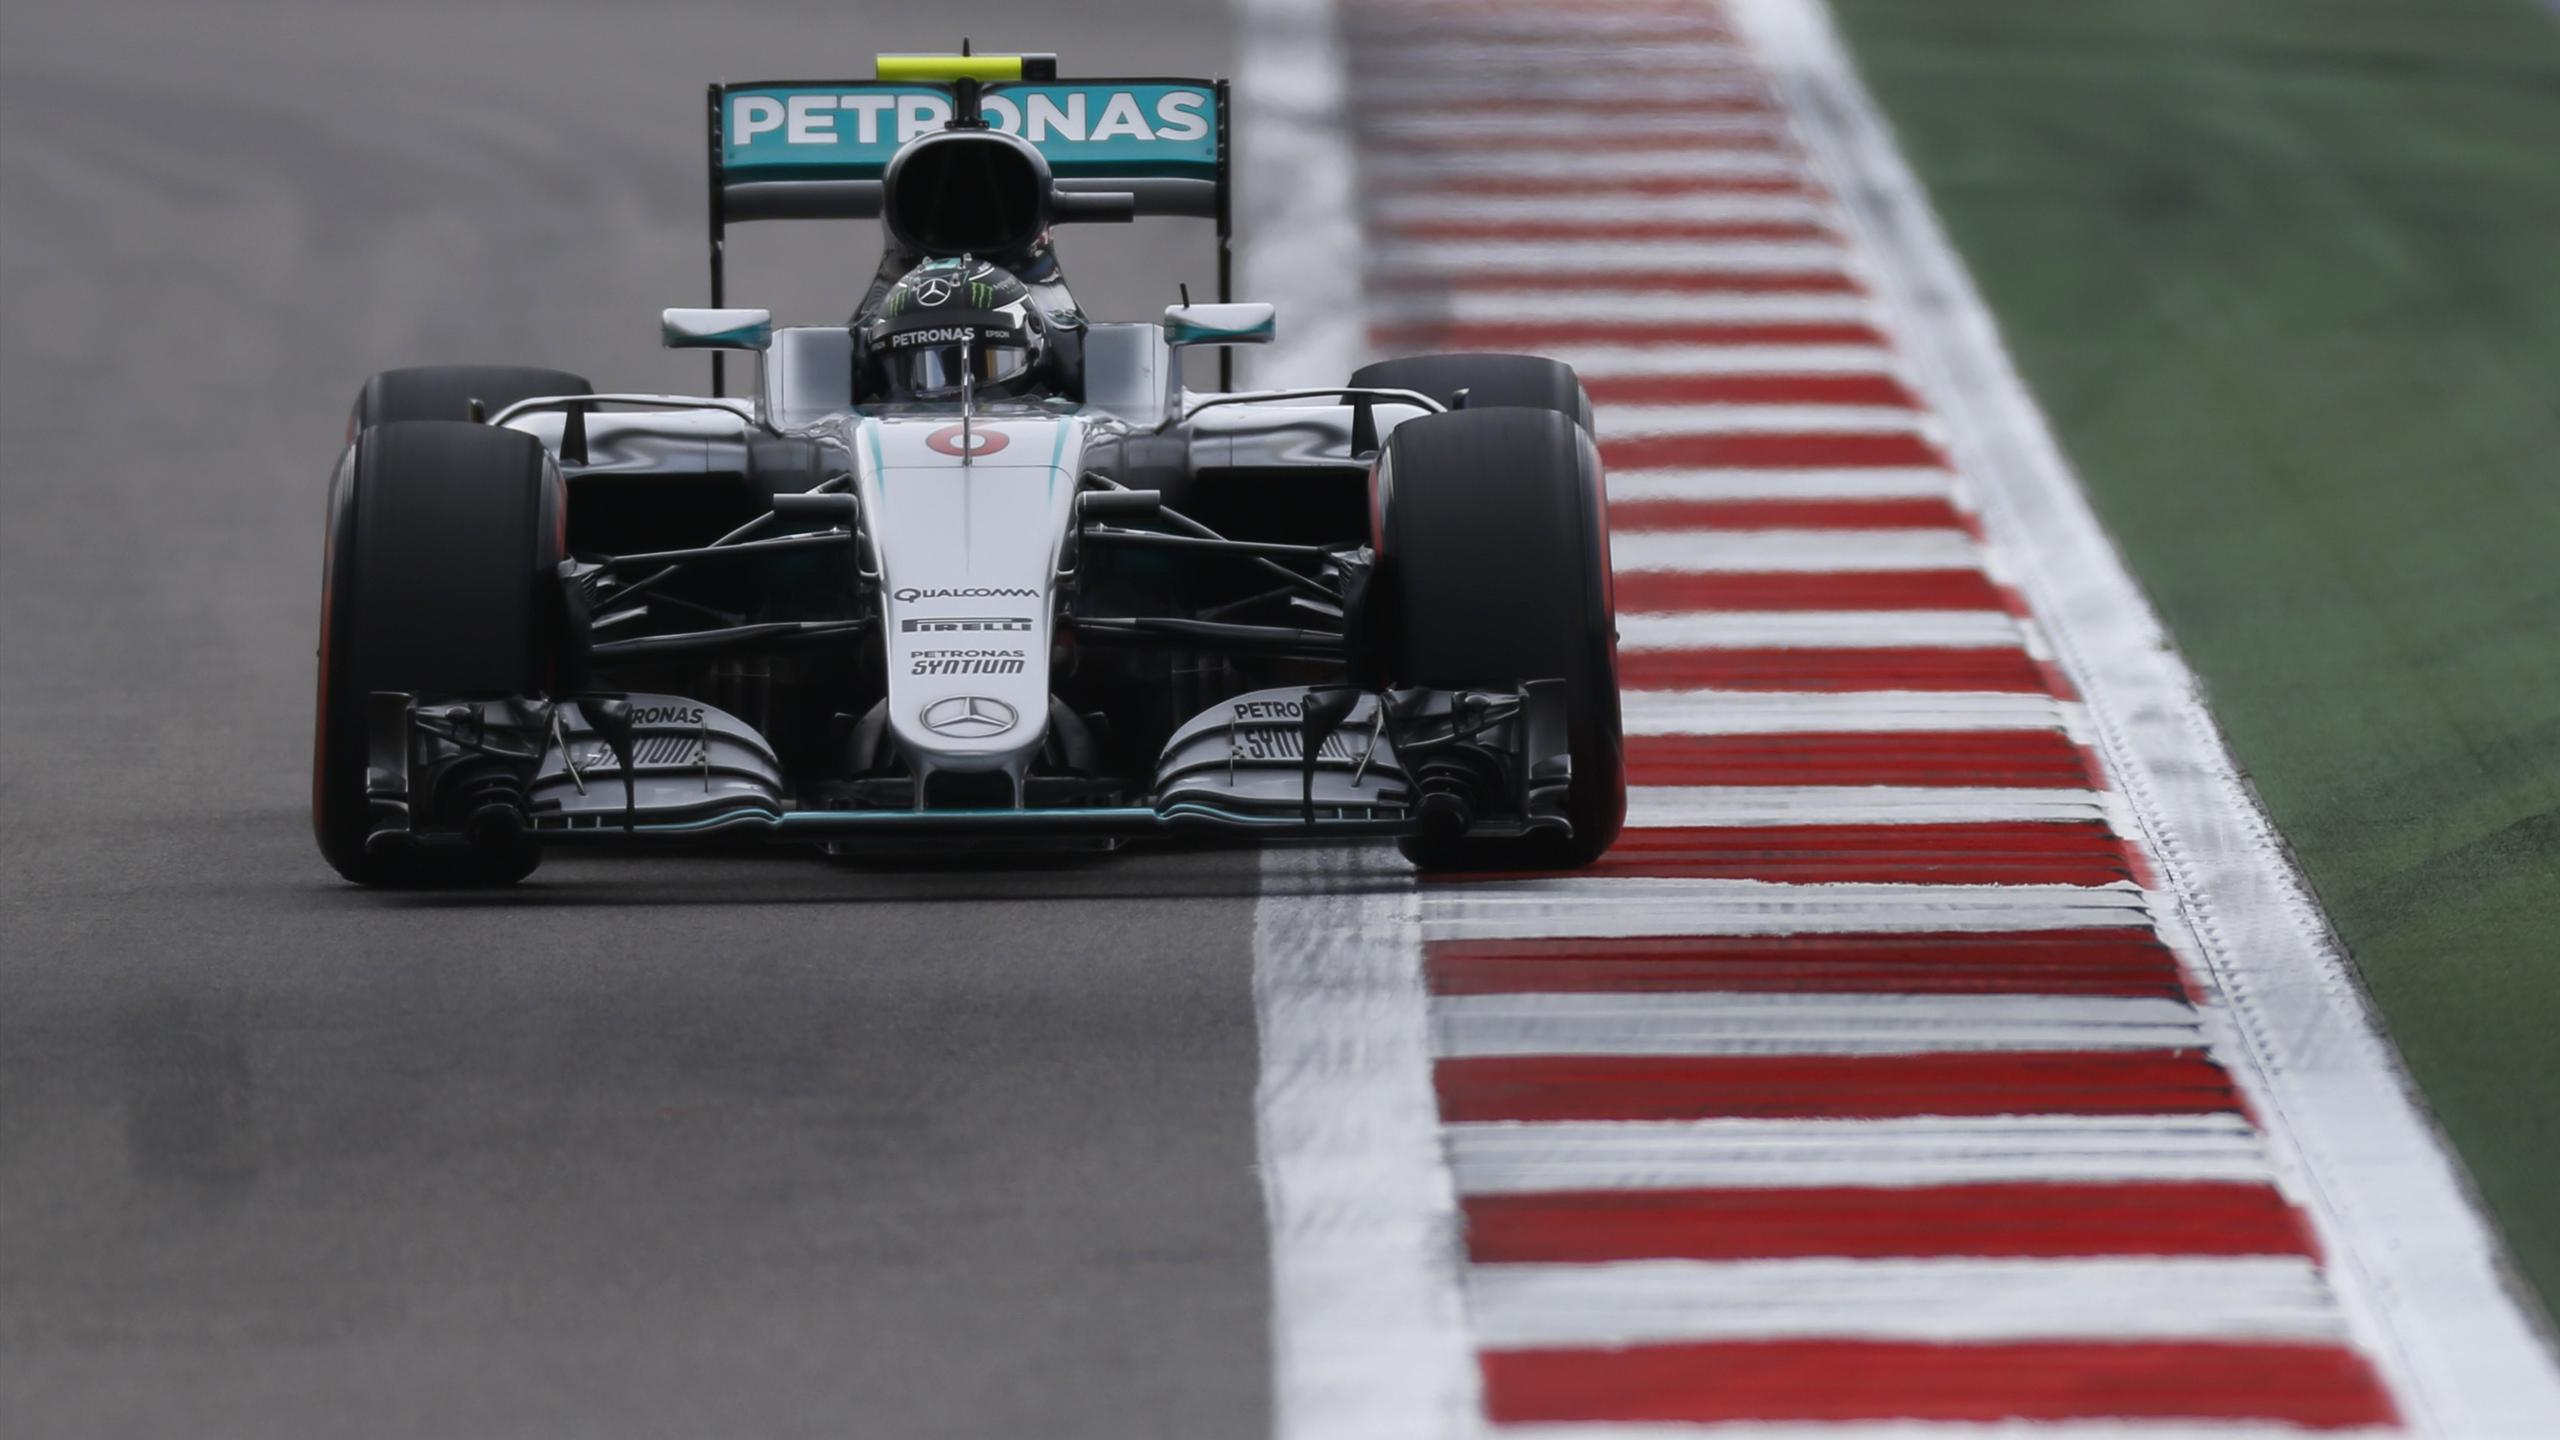 Nico Rosberg (Mercedes) - GP of Russia 2016